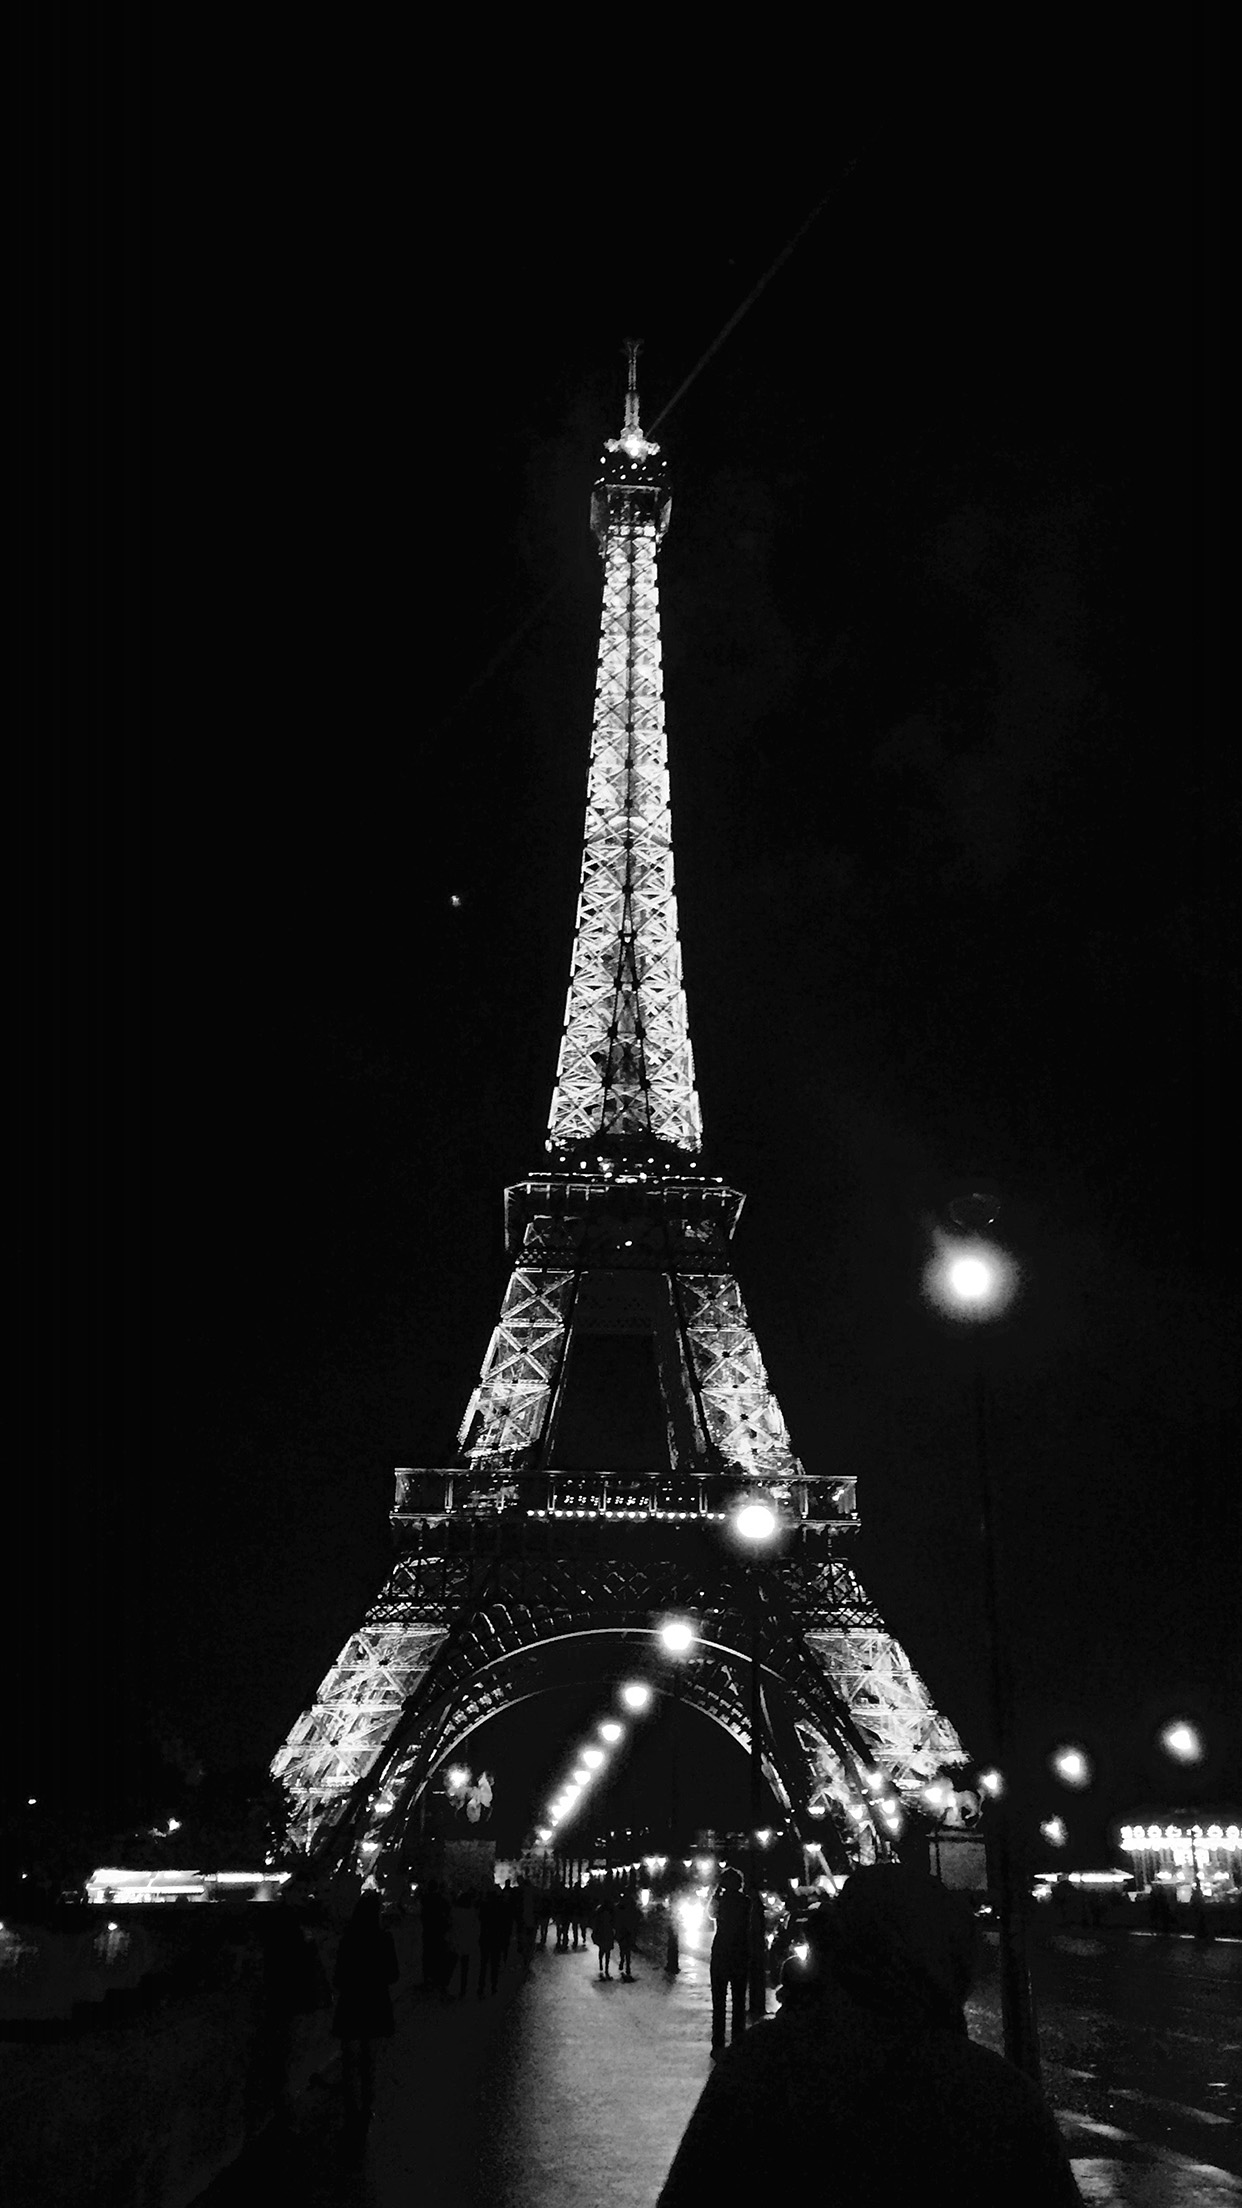 Nd29 Paris City Art Night France Eiffel Tower Dark Bw Wallpaper